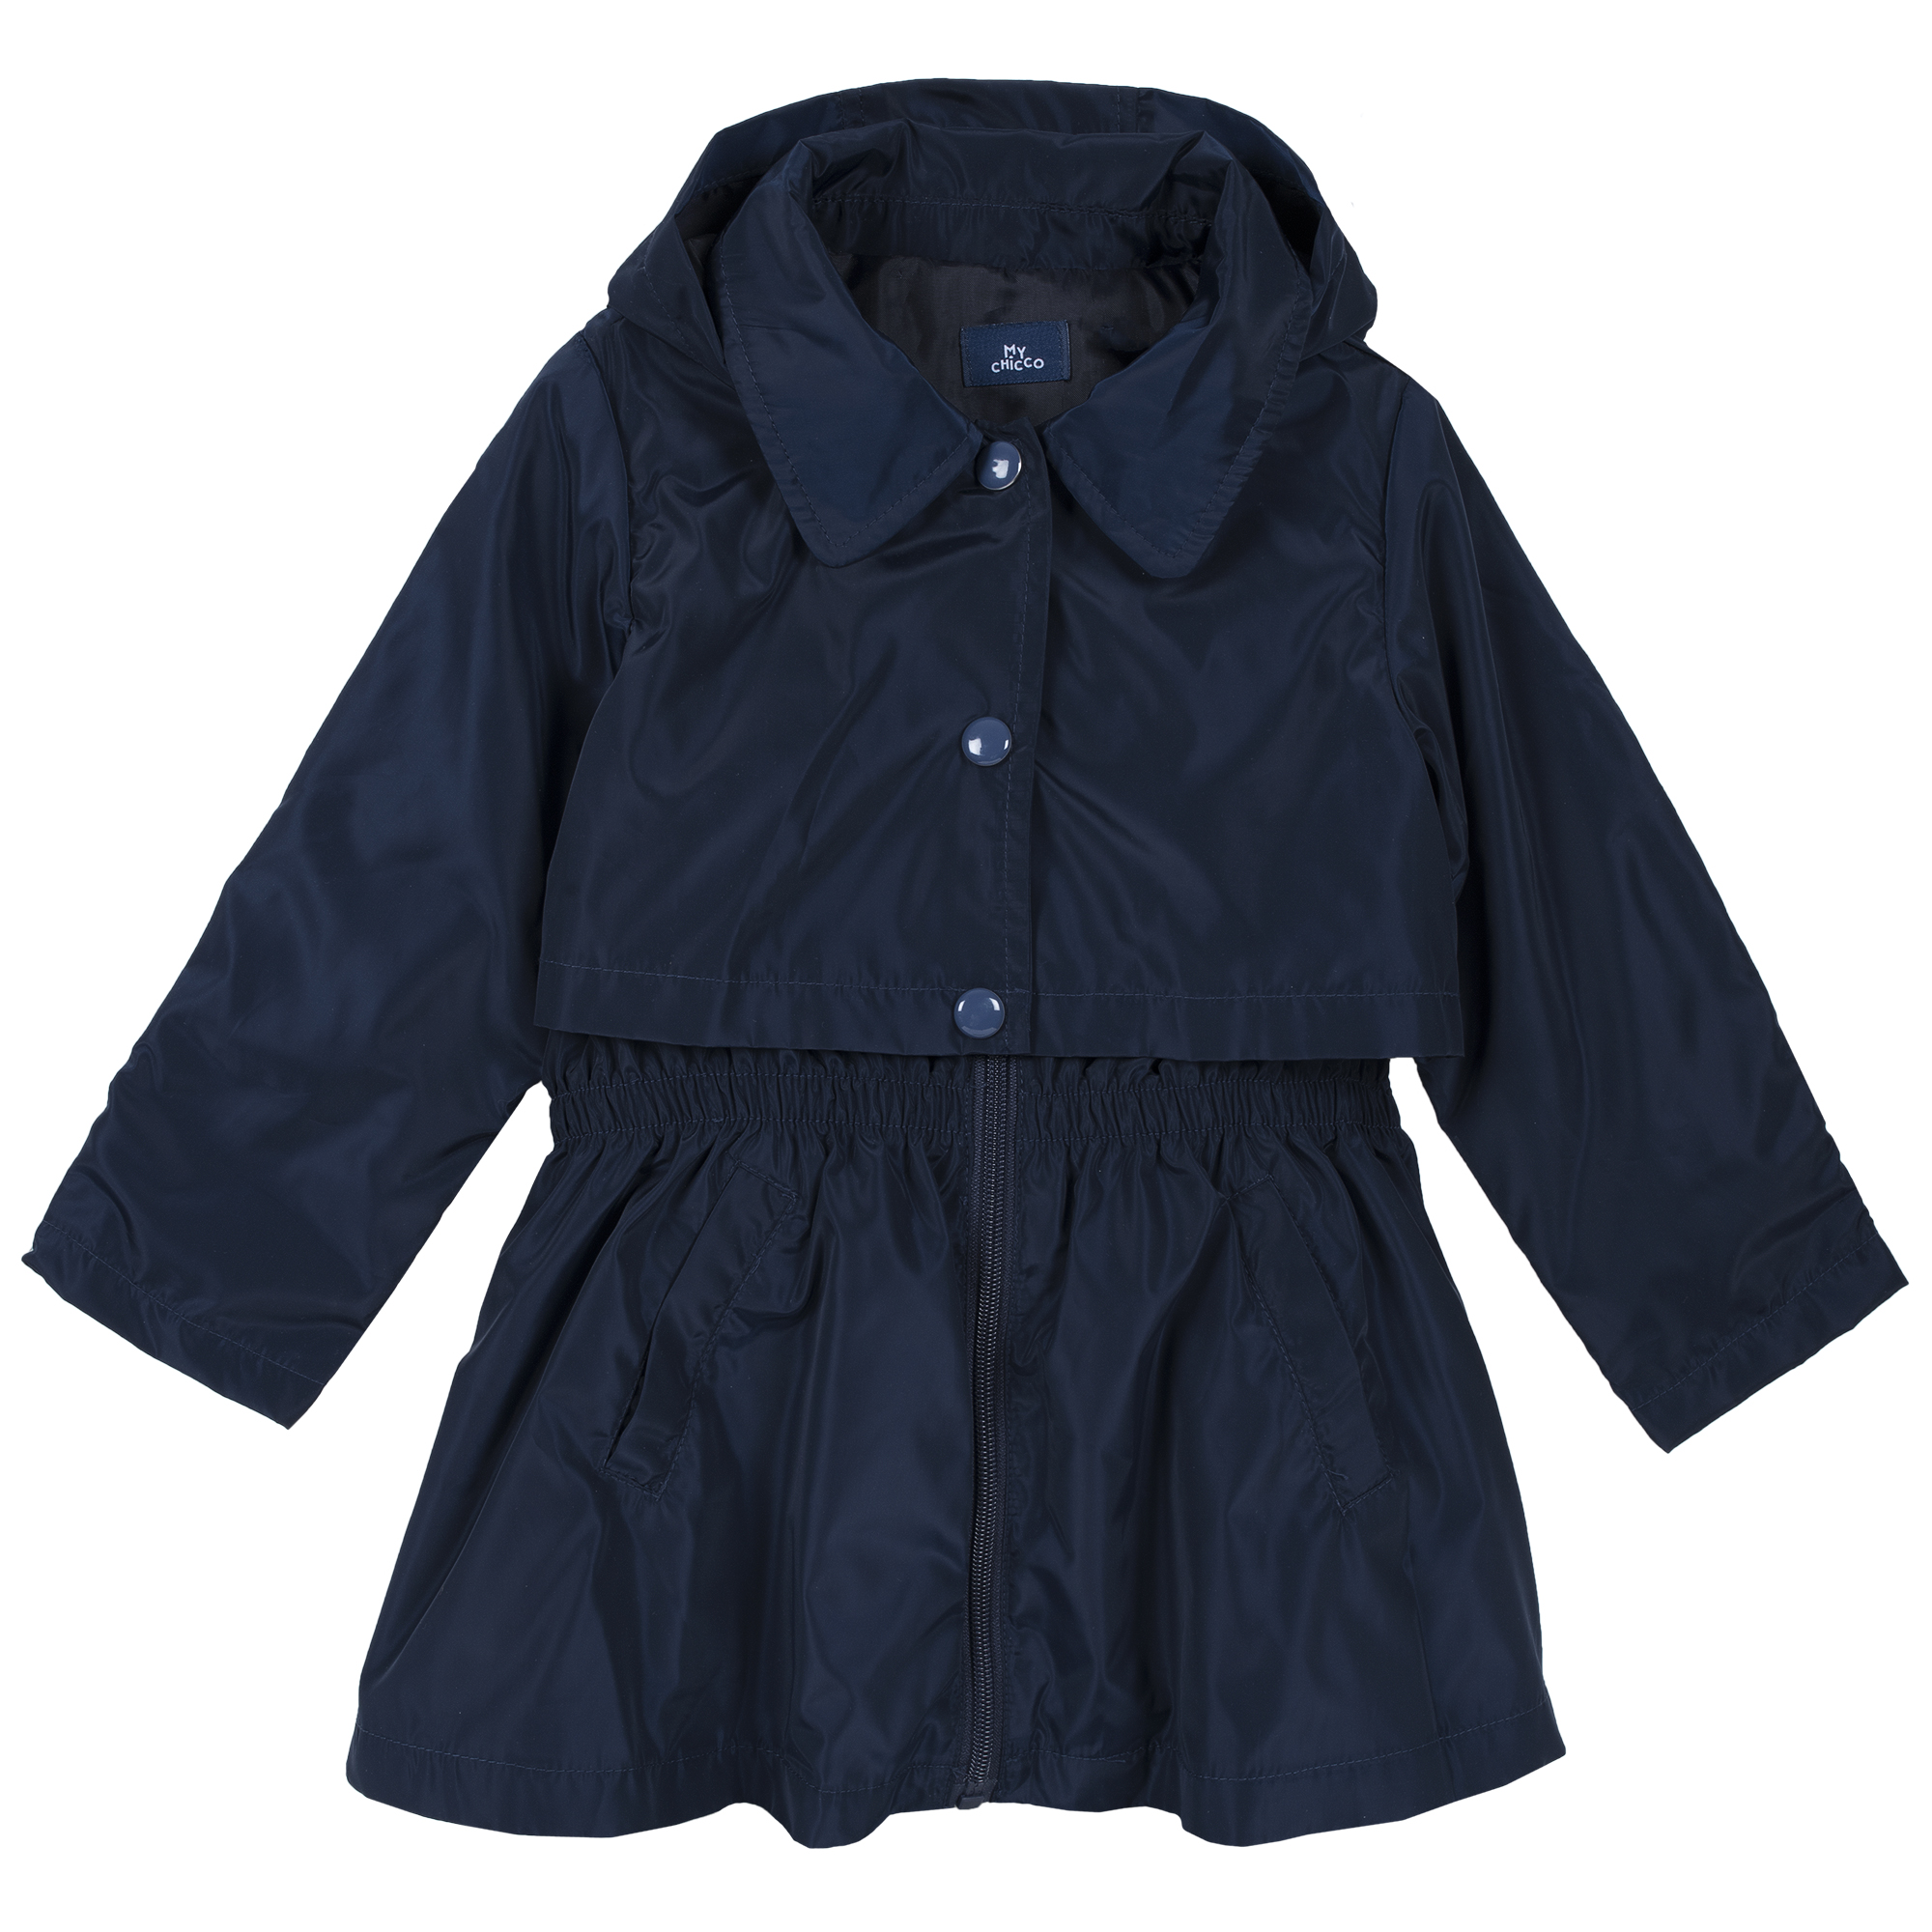 Jacheta copii Chicco, gluga detasabila, albastru inchis, 87399